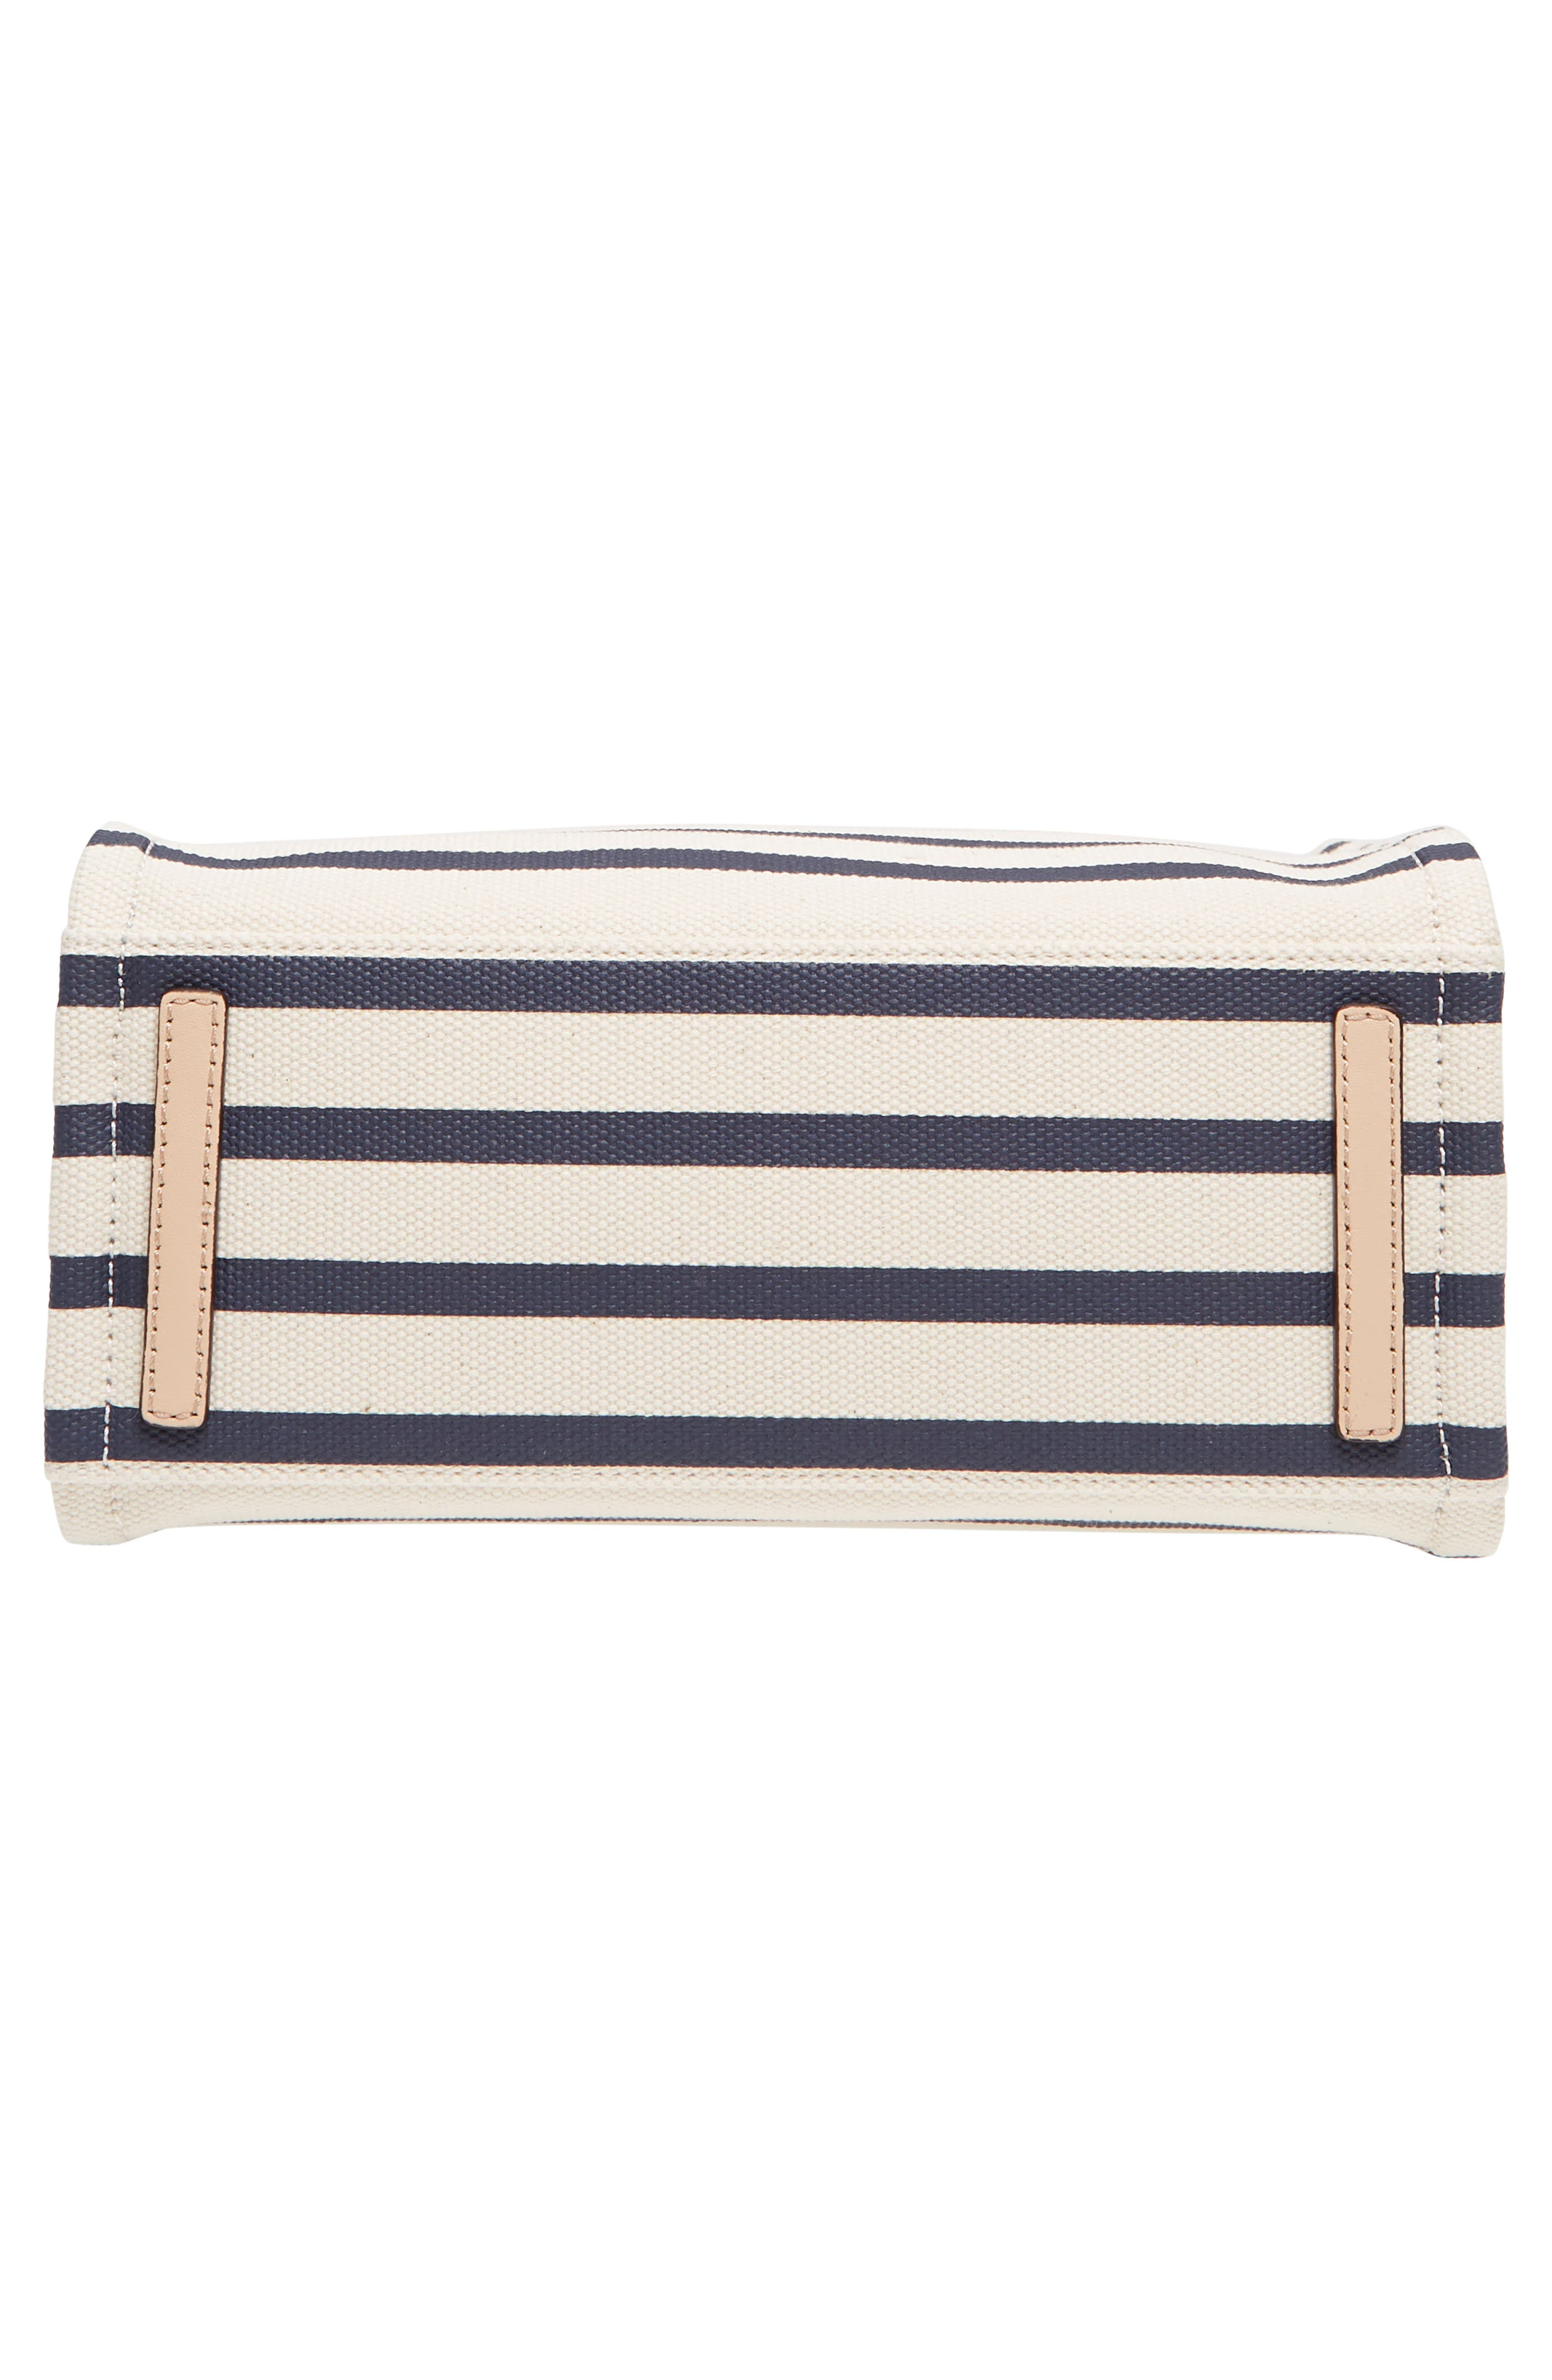 washington square - sam canvas handbag,                             Alternate thumbnail 6, color,                             Rich Navy Stripe